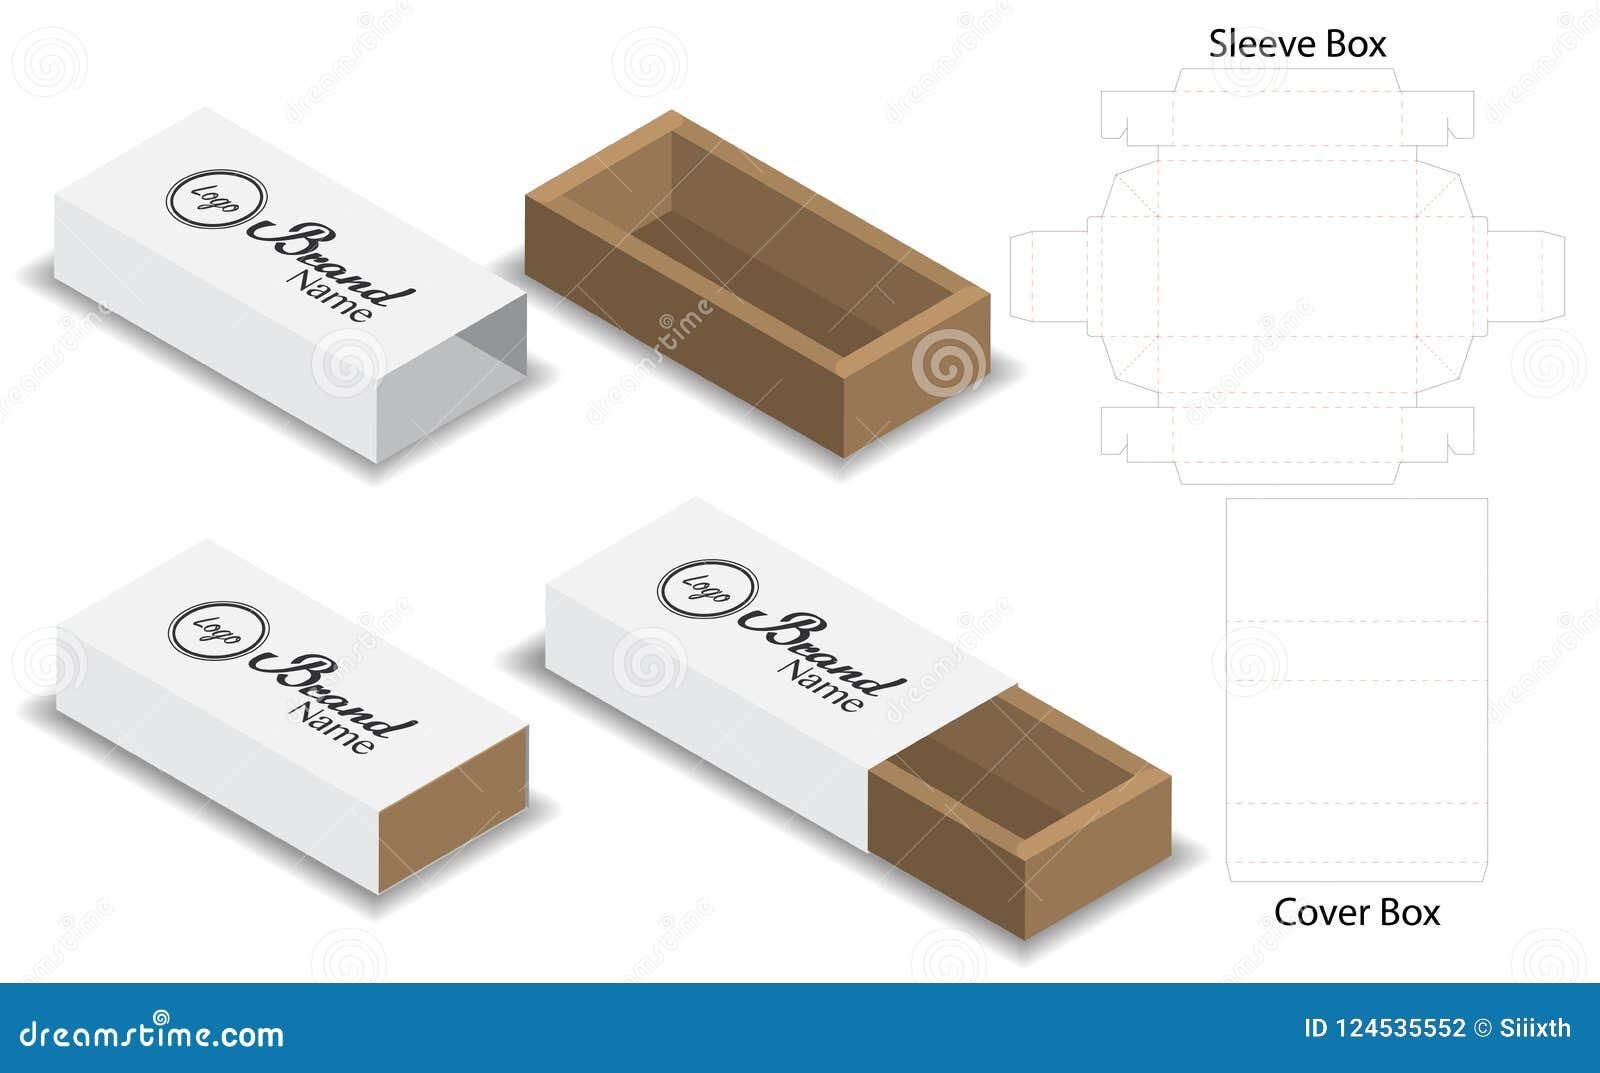 slide box die cut mock up template vector stock vector